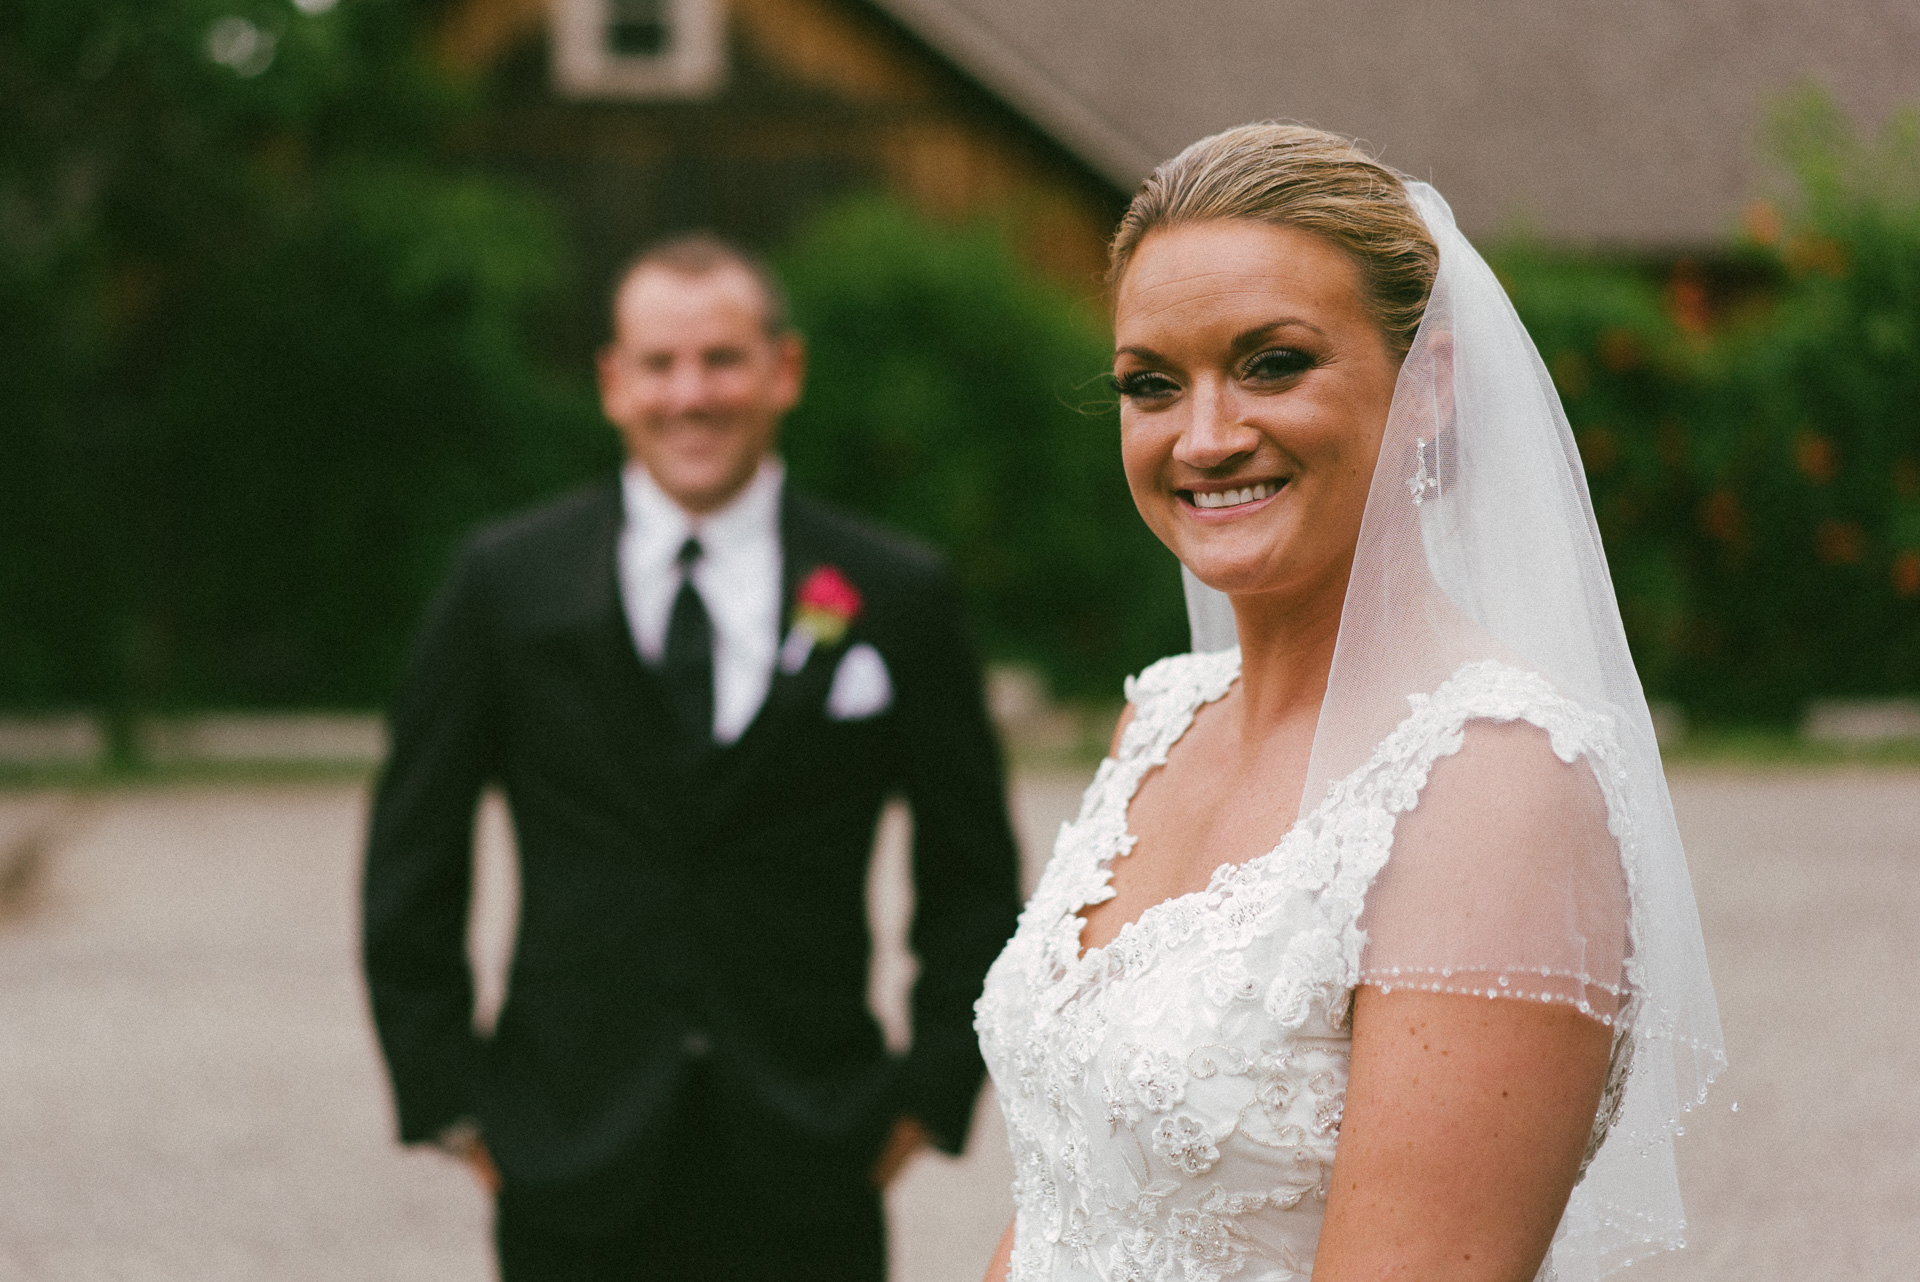 Dayton Wedding Photographer - Beautiful Bride